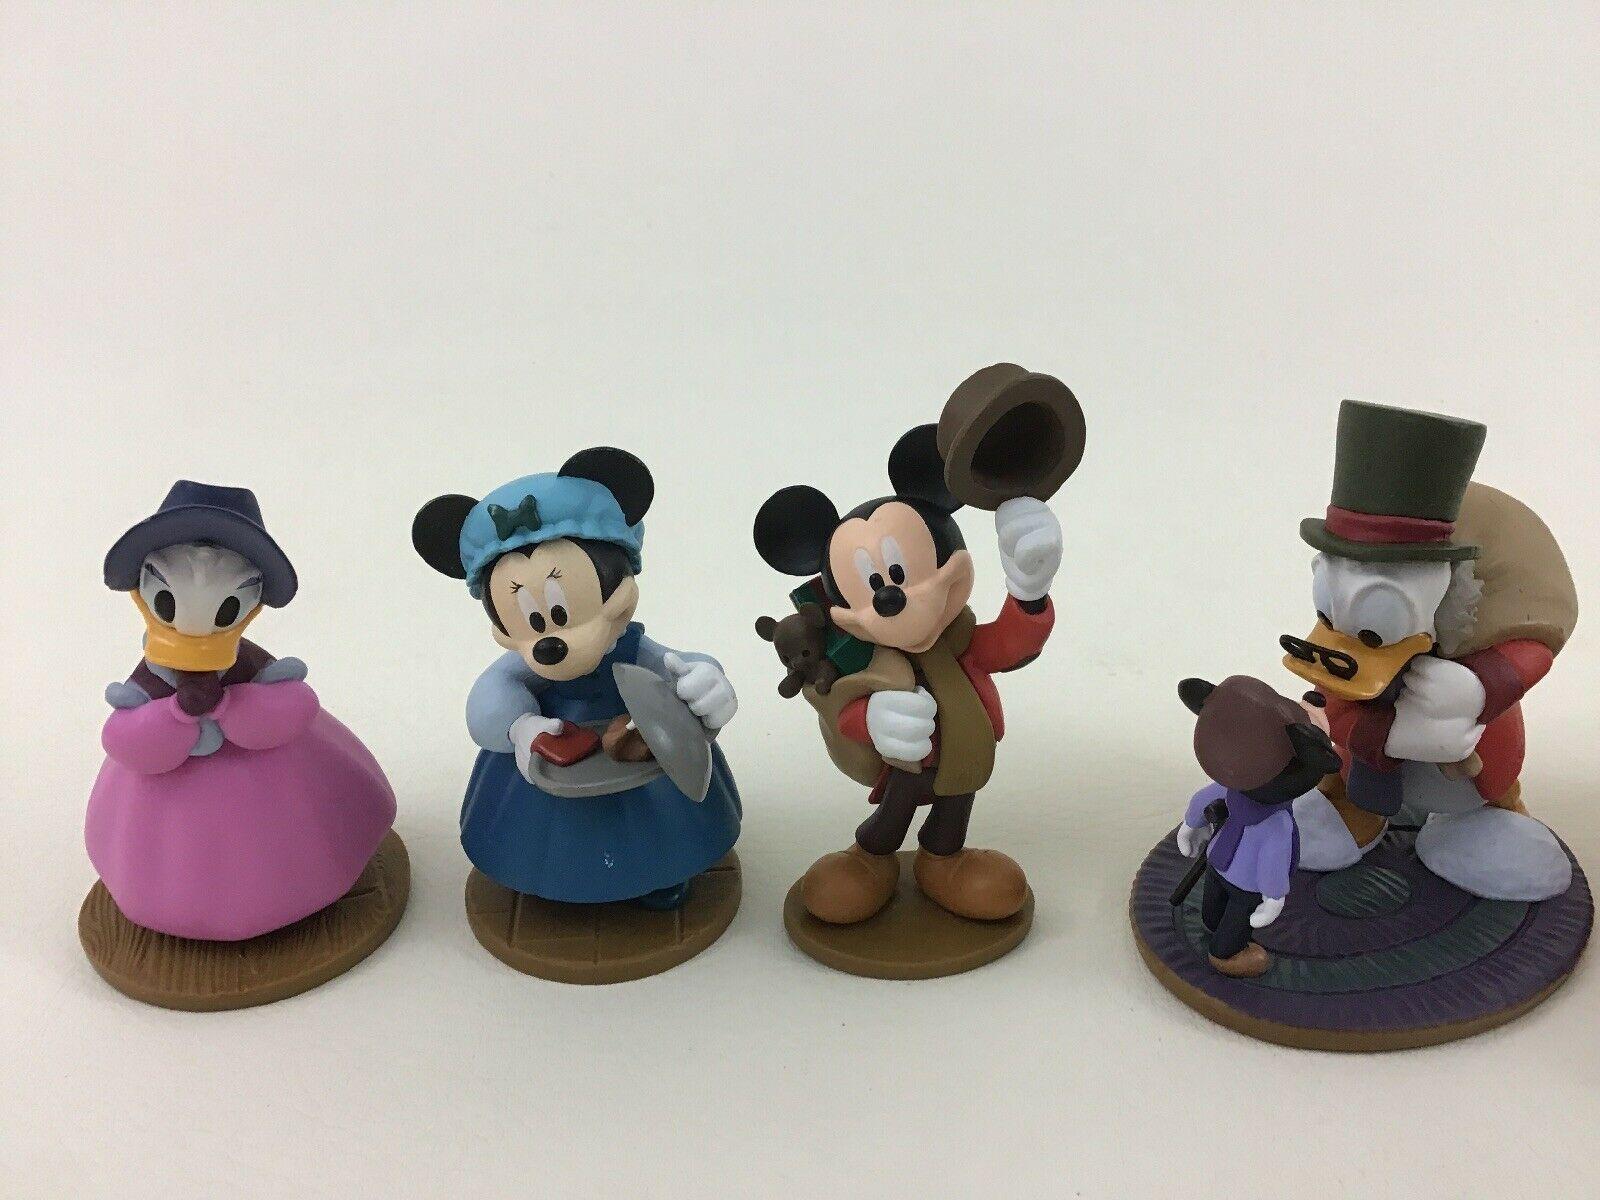 Mickeys Christmas Carol Minnie.Disney Mickey S Christmas Carol 6pc Pvc Toys And 50 Similar